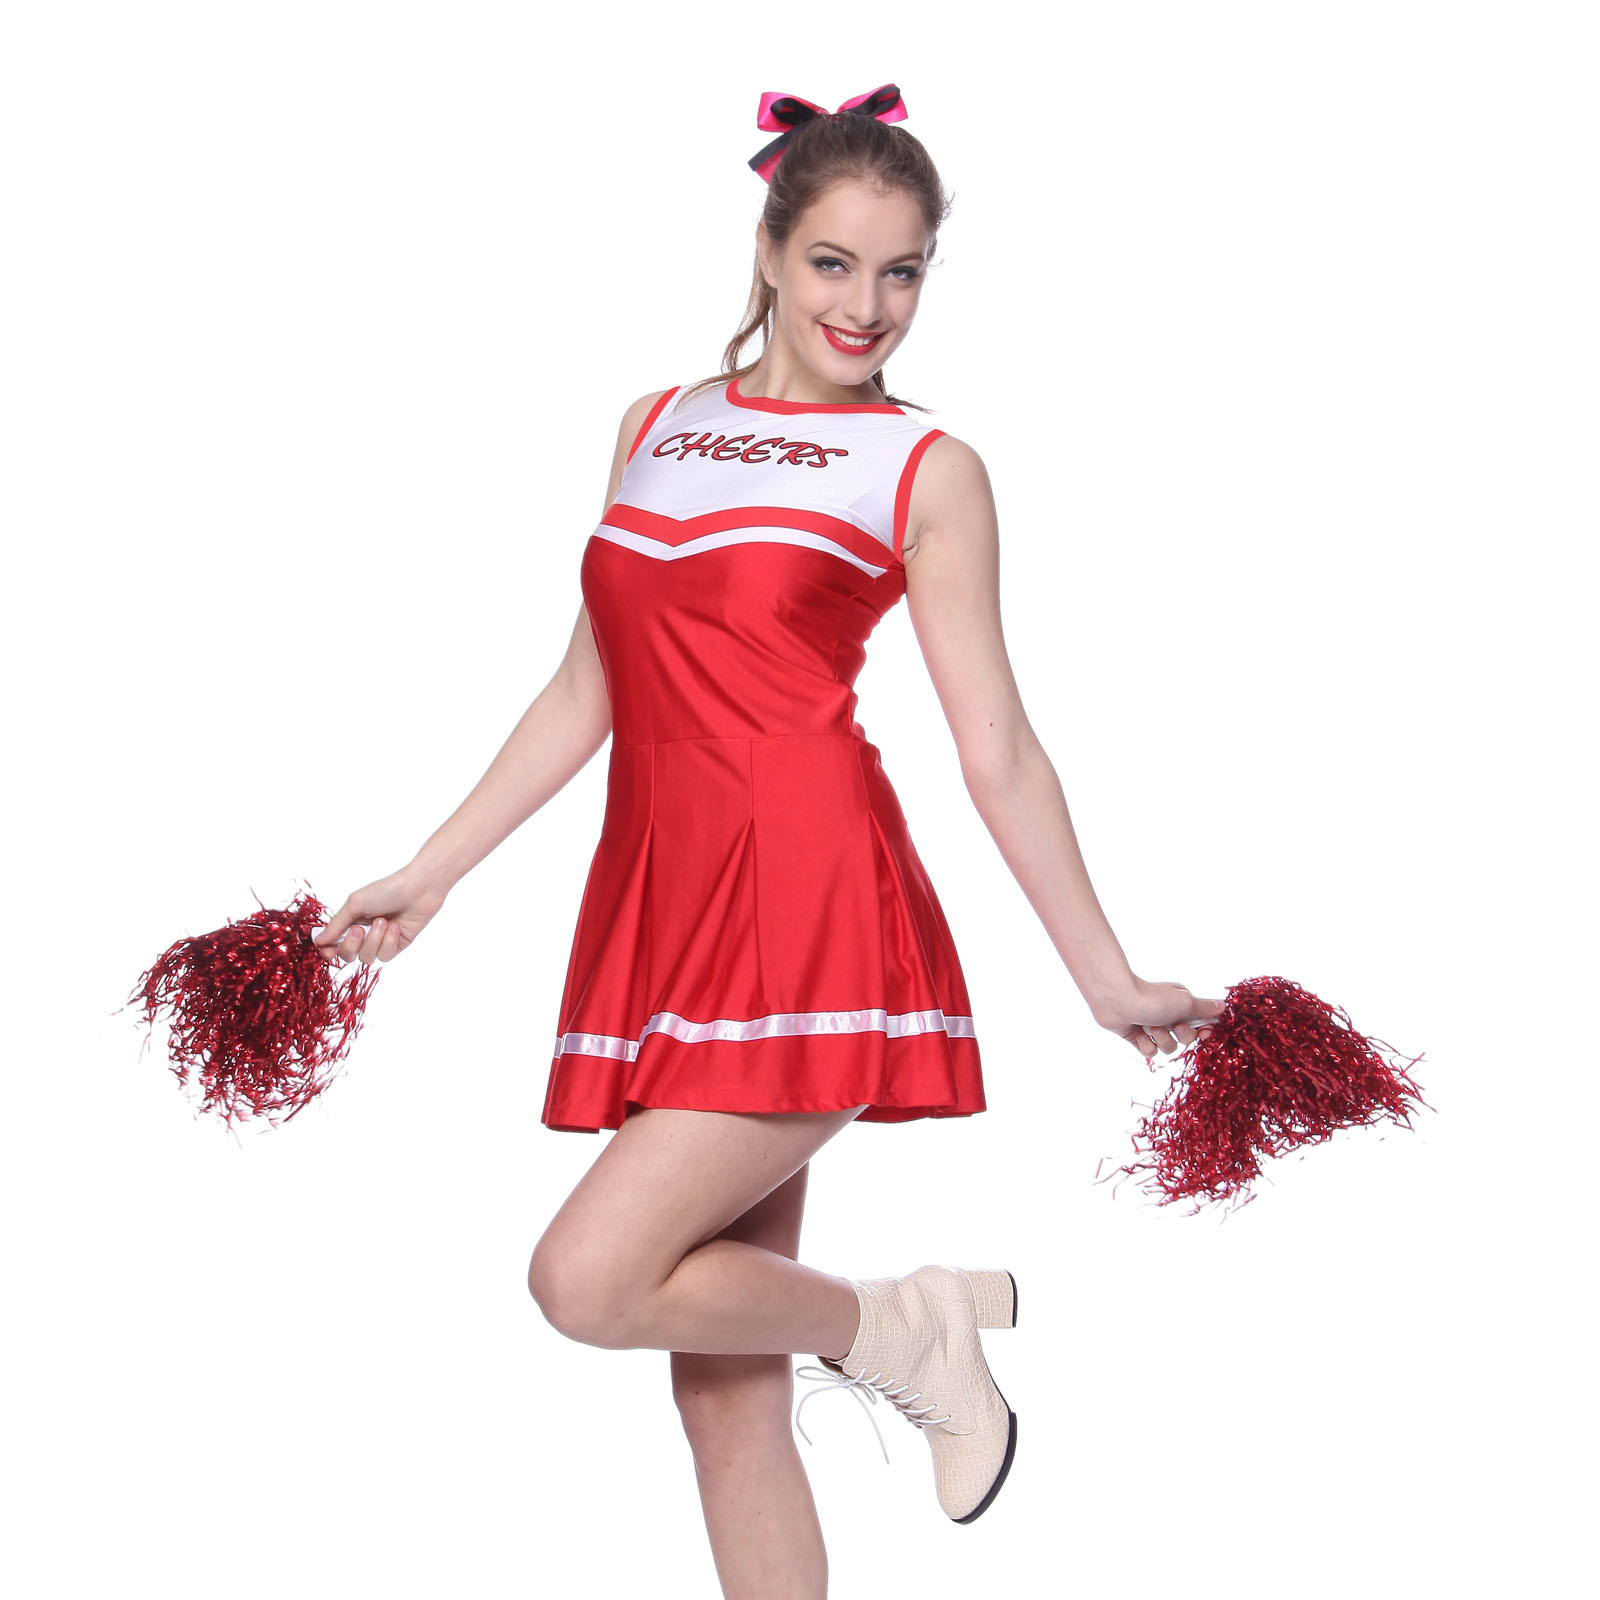 adult high school cheerleader outfit fancy dress costume